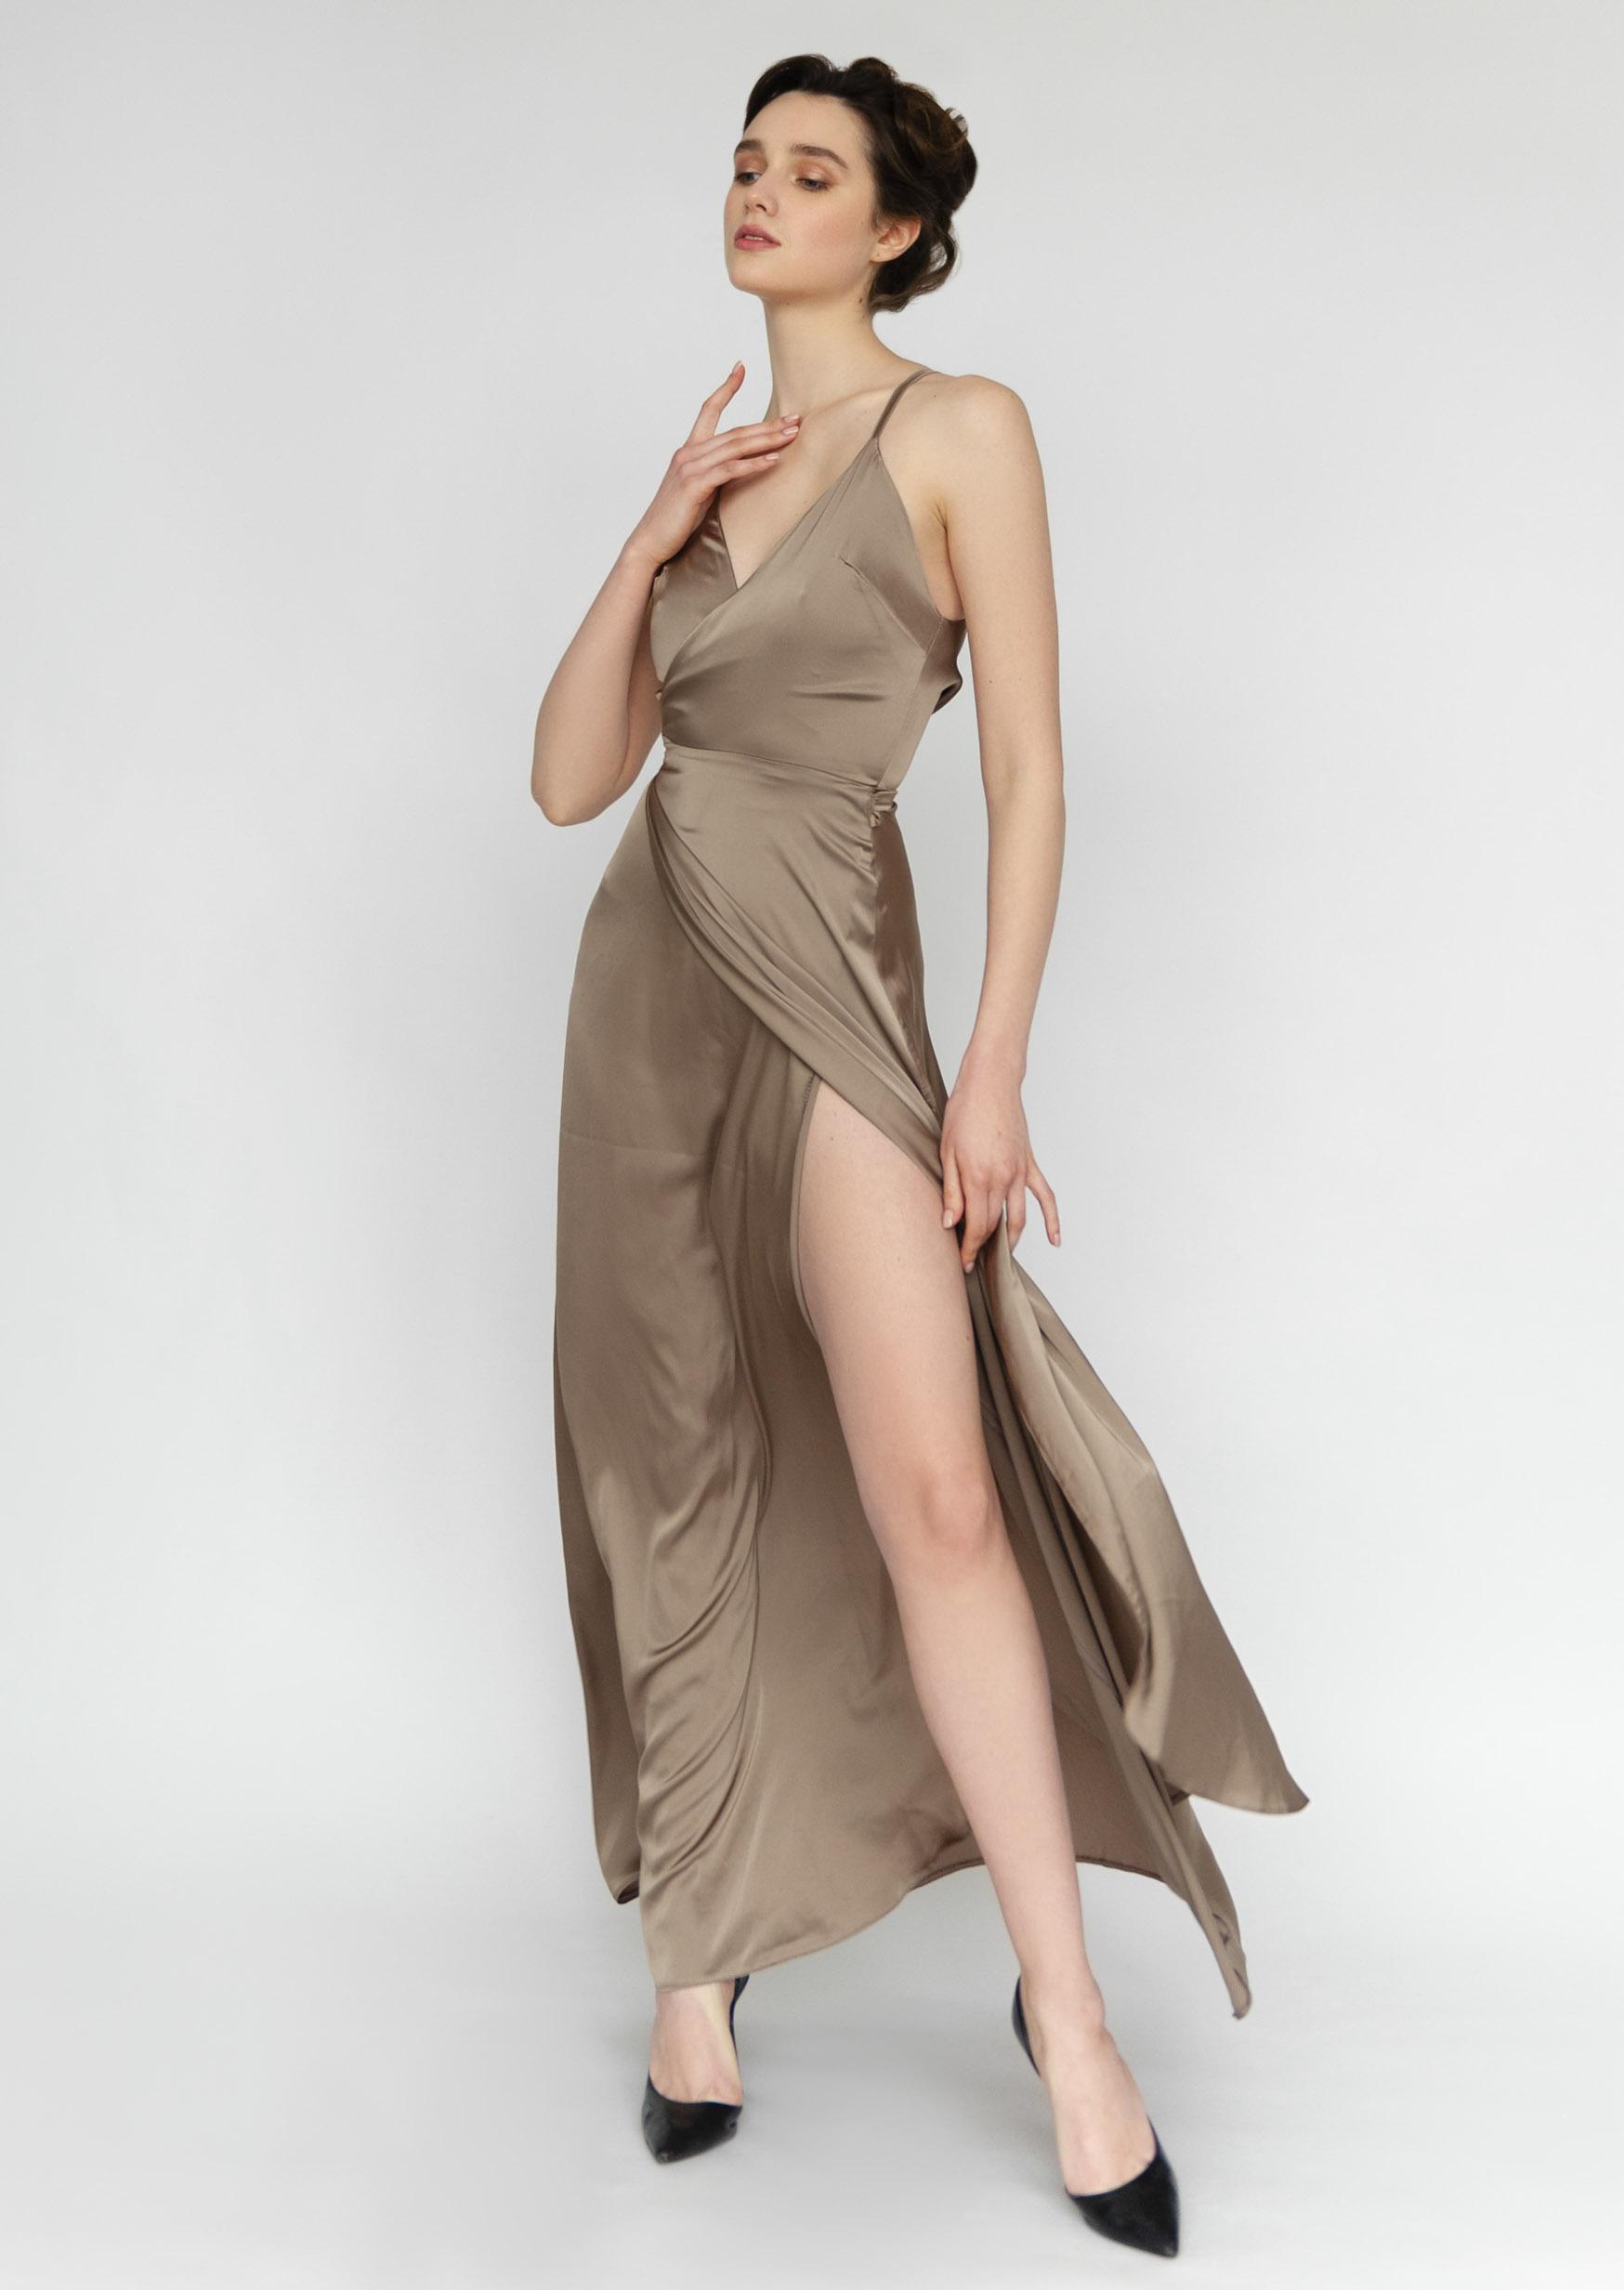 Sunset sky dress long asymetrical silk slip dress